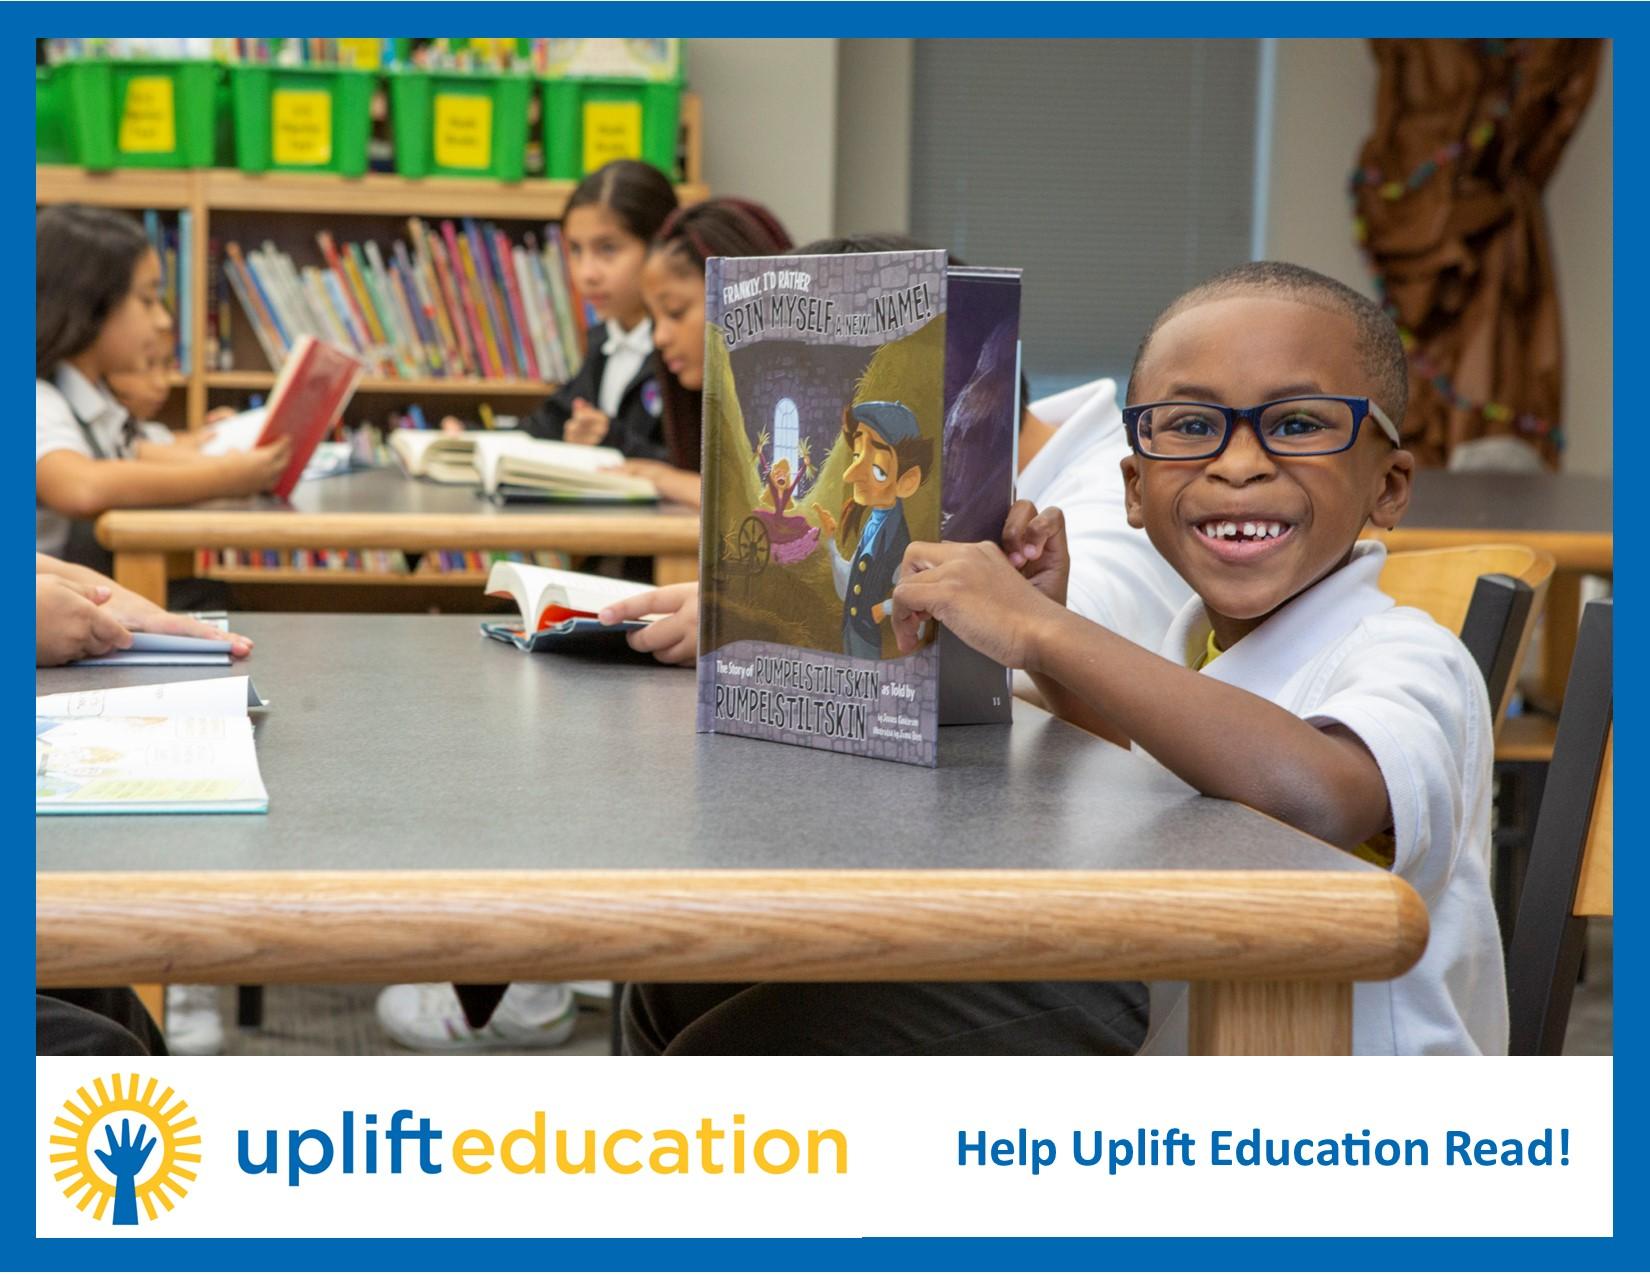 Help Uplift Education Read!